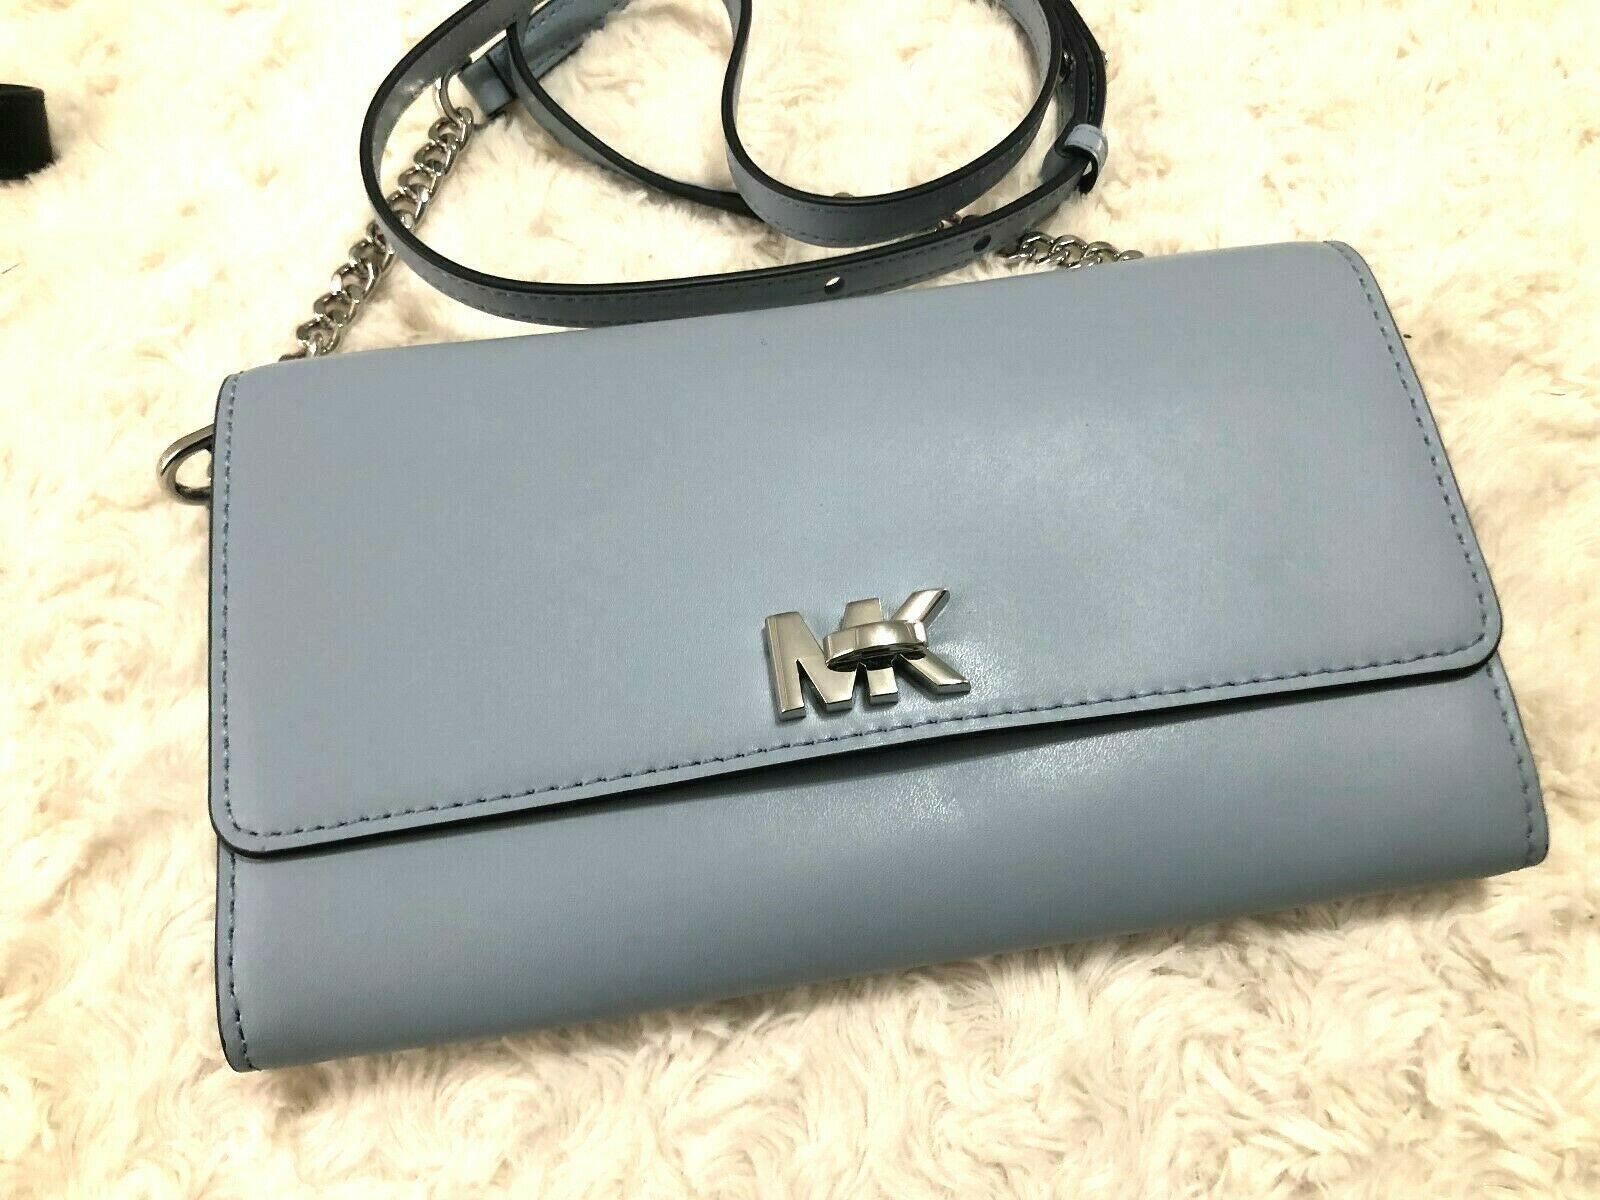 Michael Kors Mott XL Wallet on a Chain Crossbody Clutch Bag Pale Blue Msrp 178